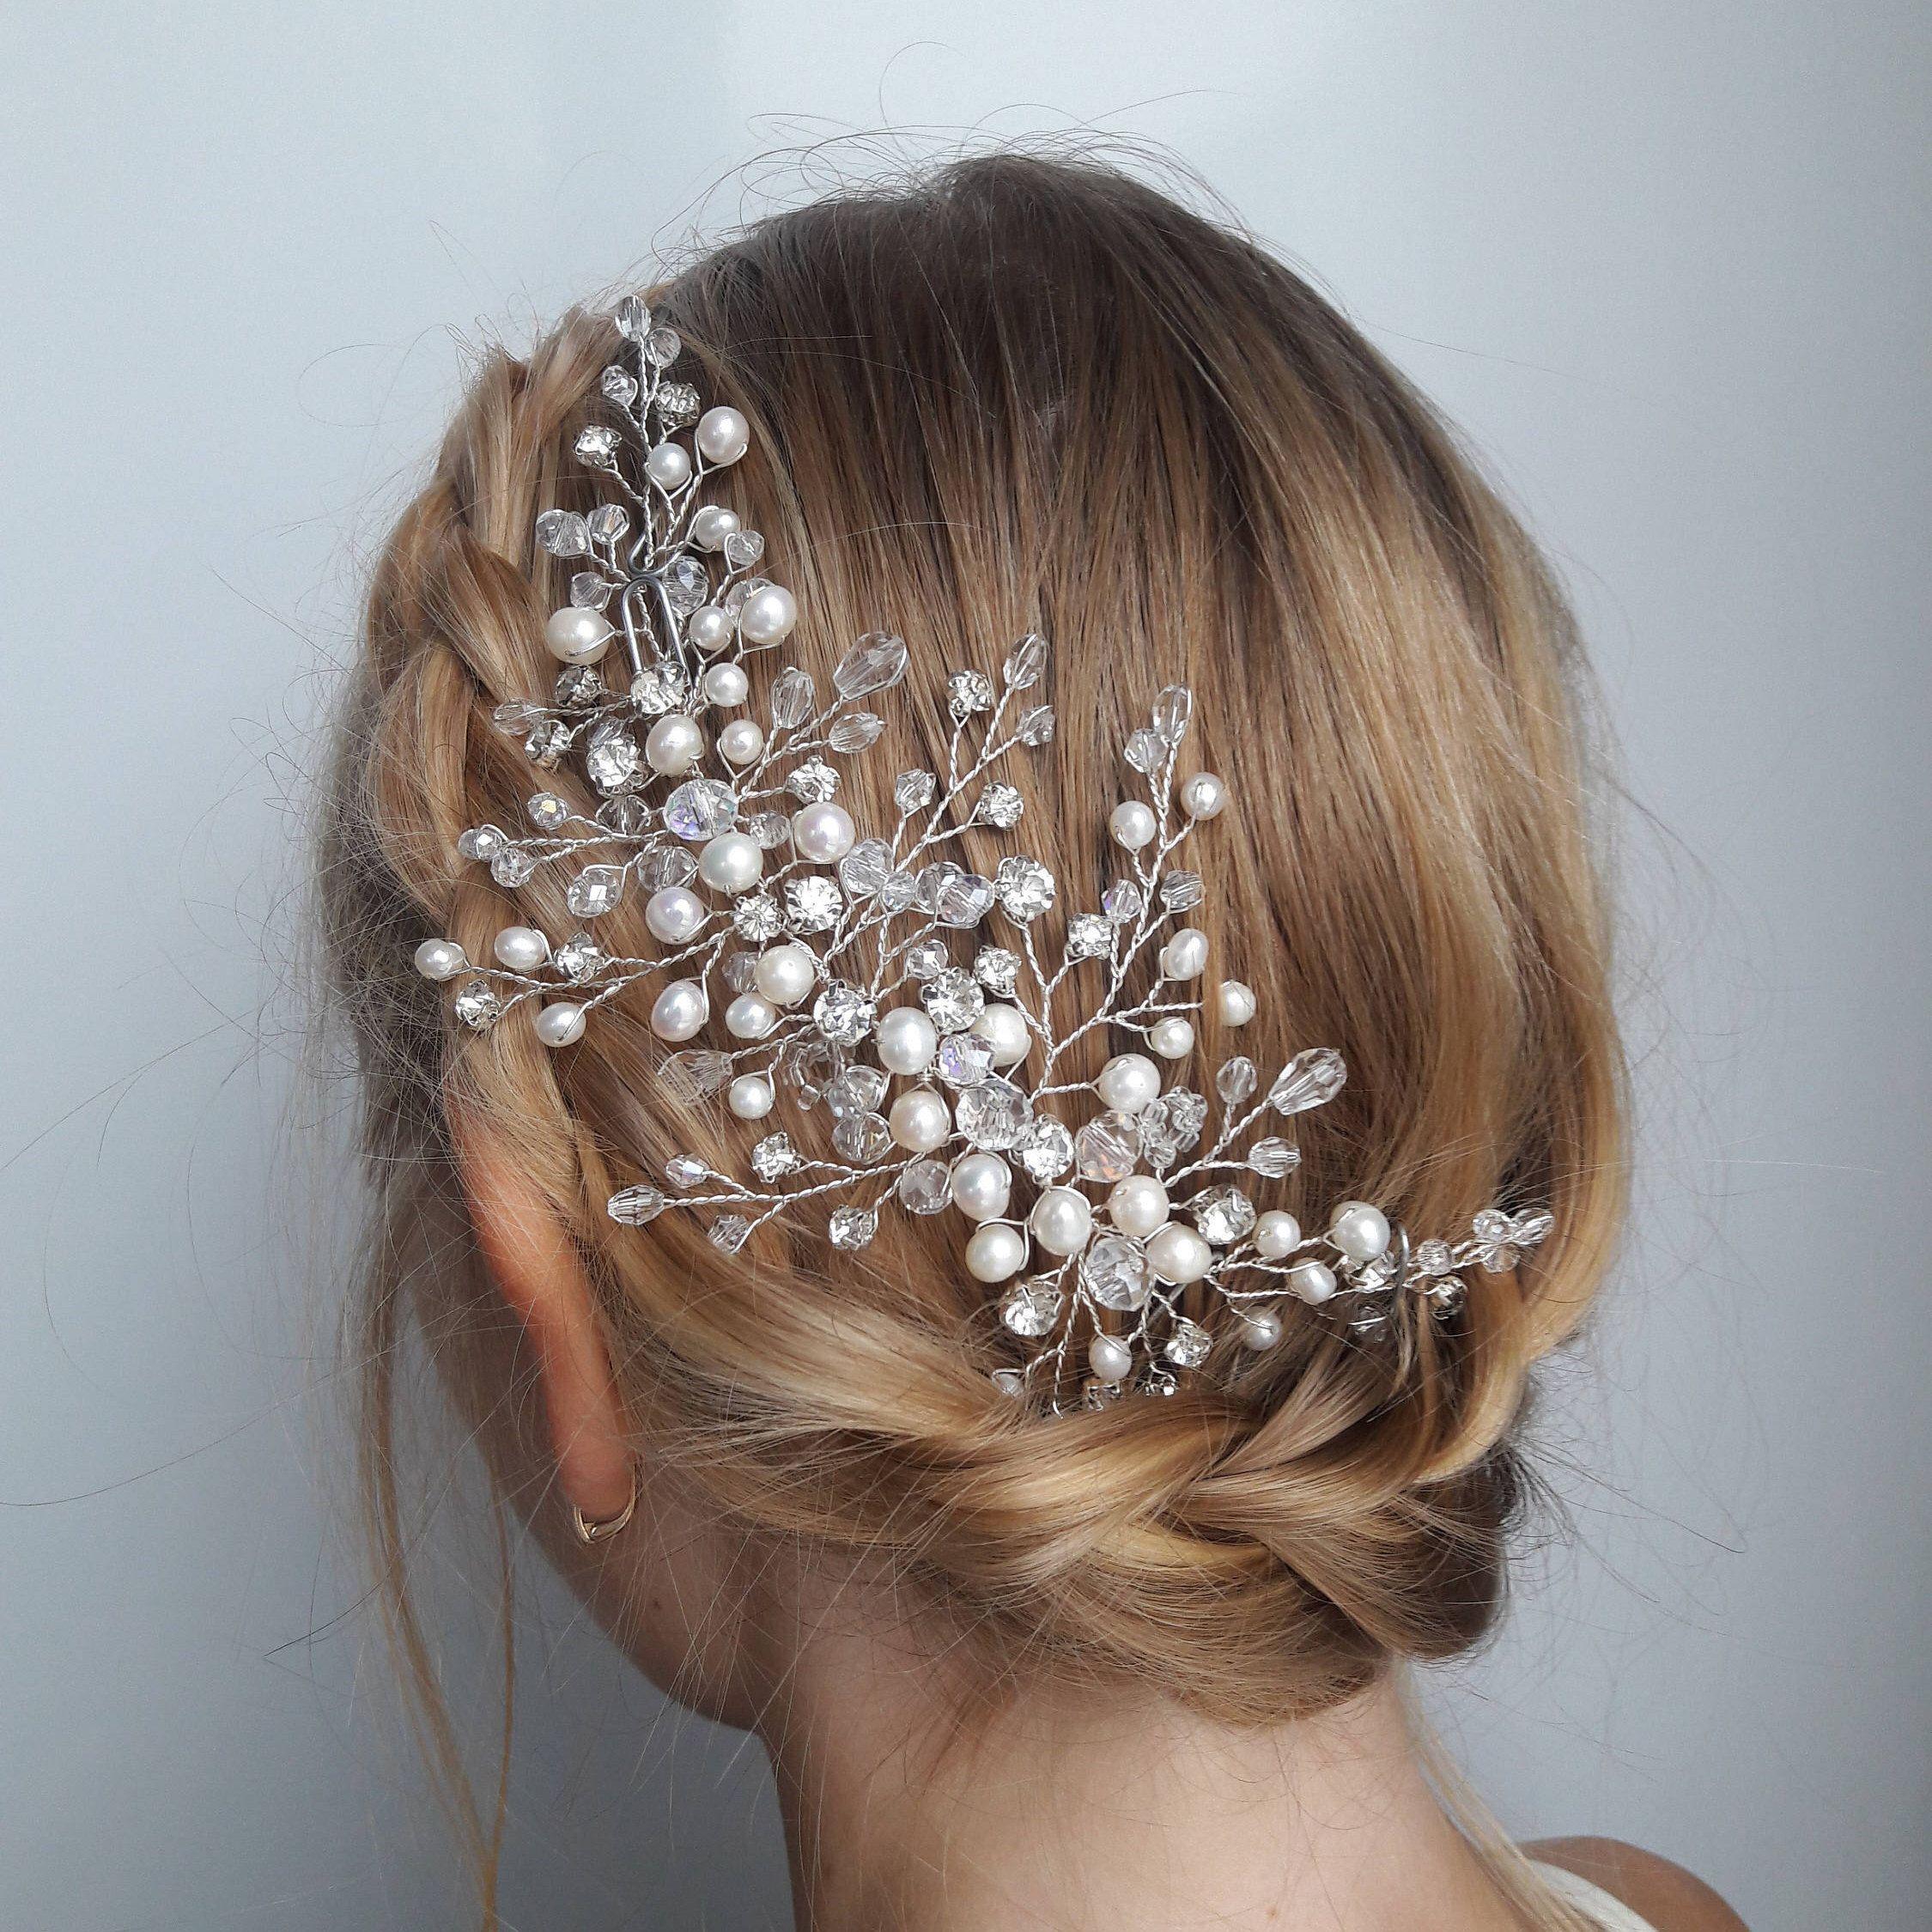 Bridal hair clip,Gold Hair Jewelry,bride accessories Pearl /& Crystal Diamond Rhinestone Bridal Headband Bride Comb bride headpiece